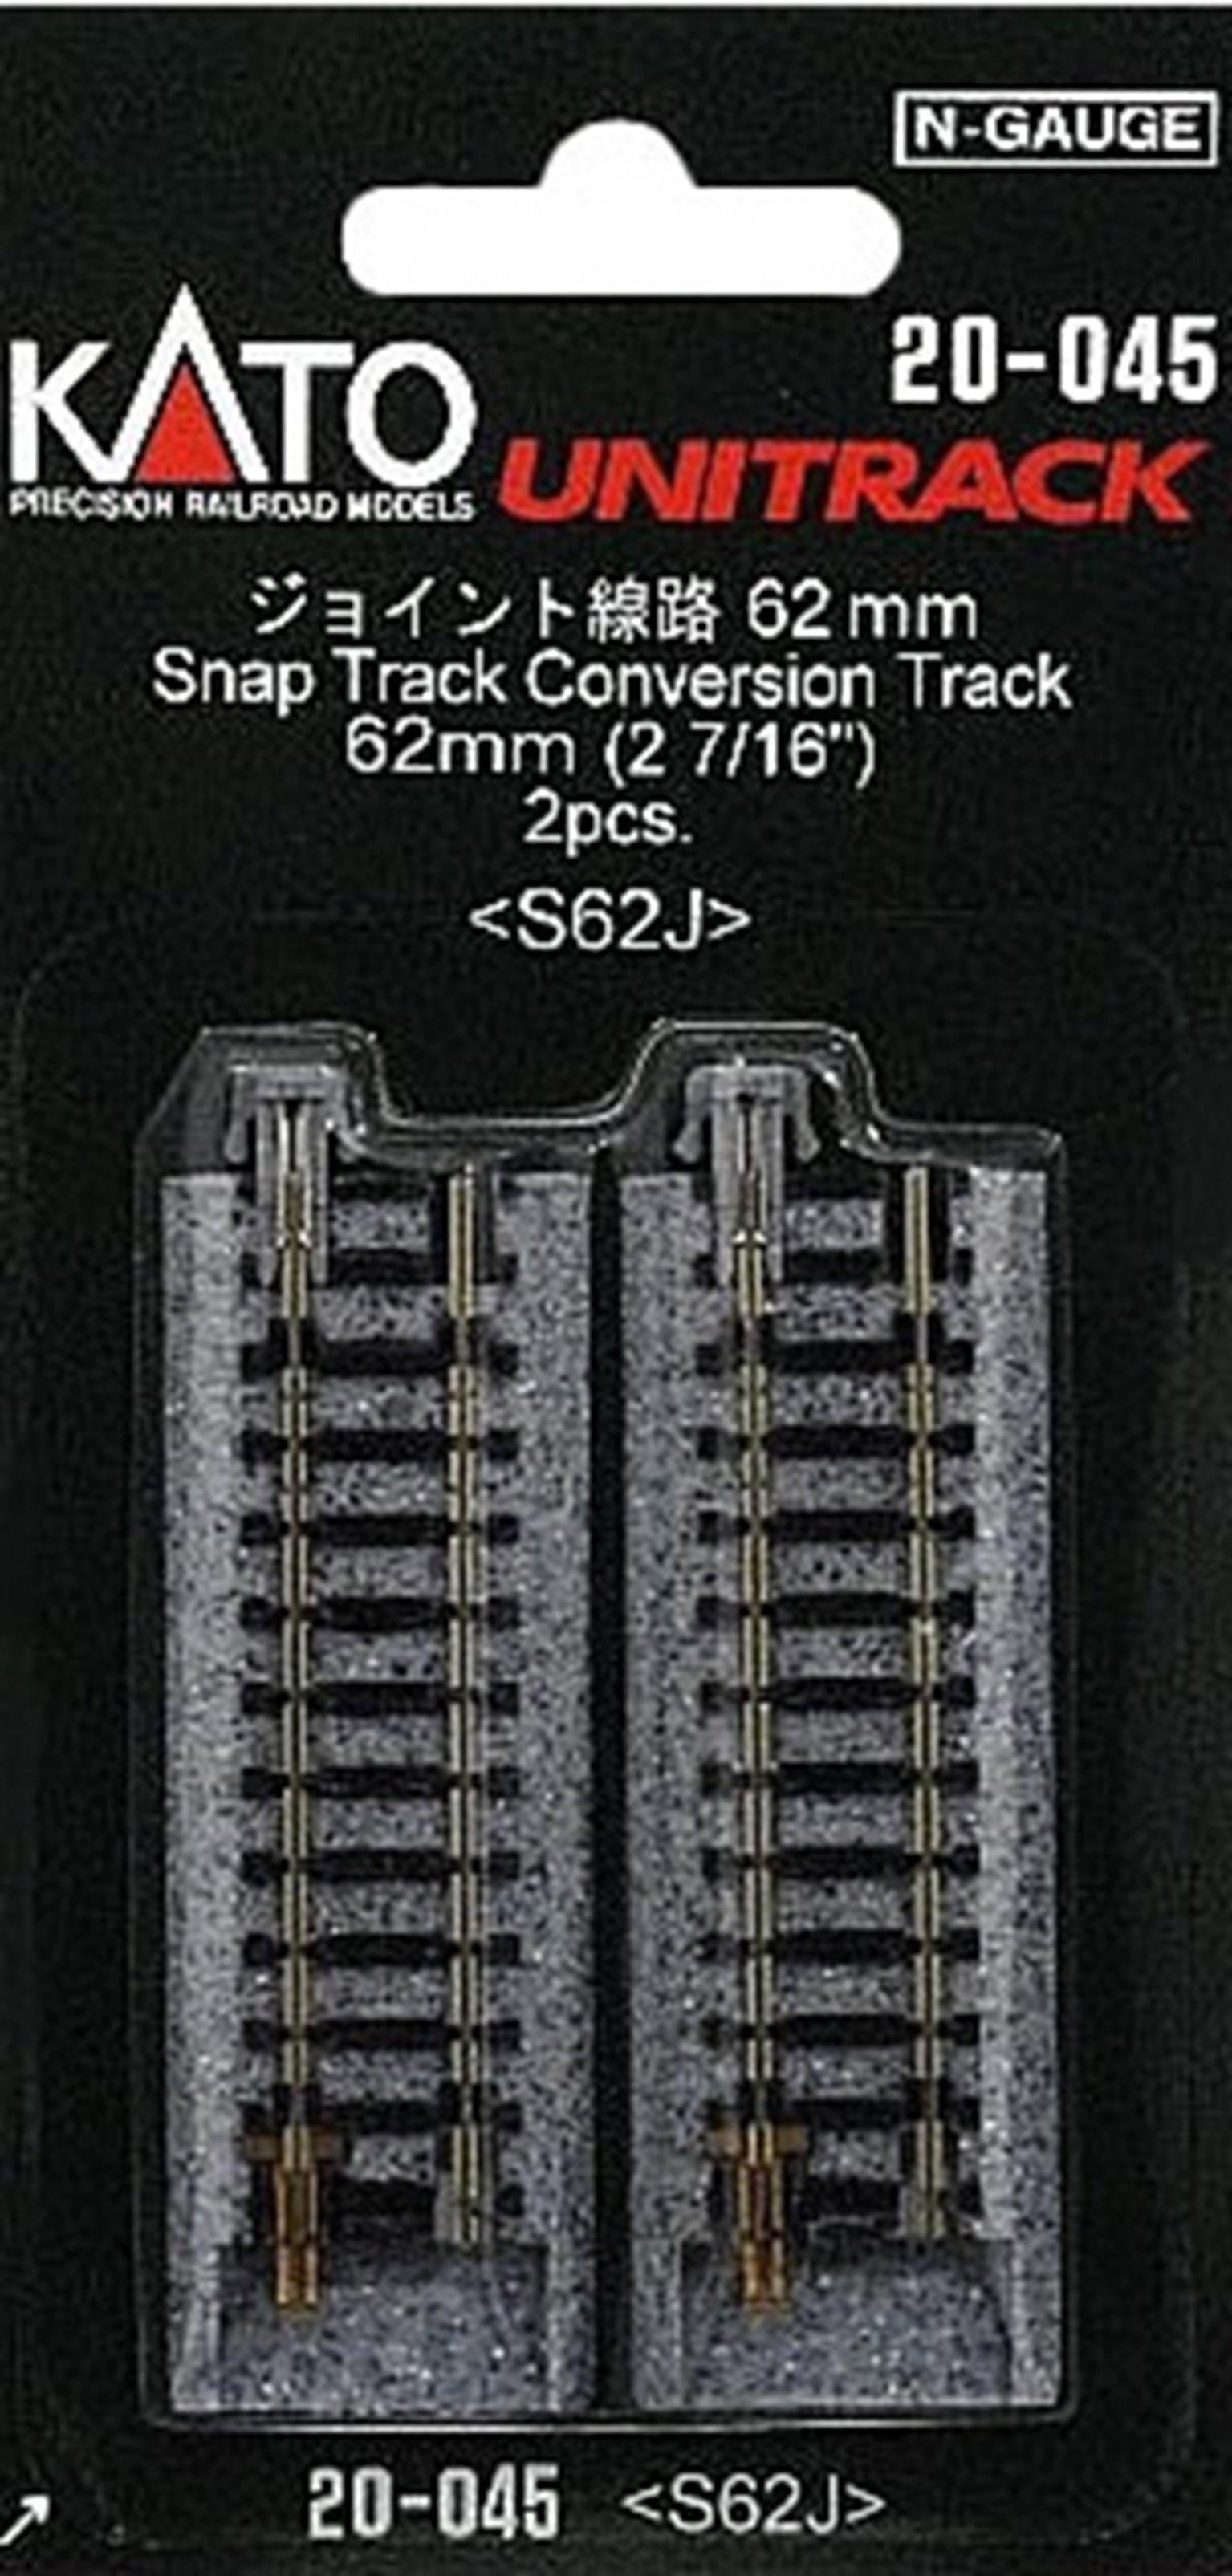 Kato 20-045 Ground Level Single Conversion Track (2)